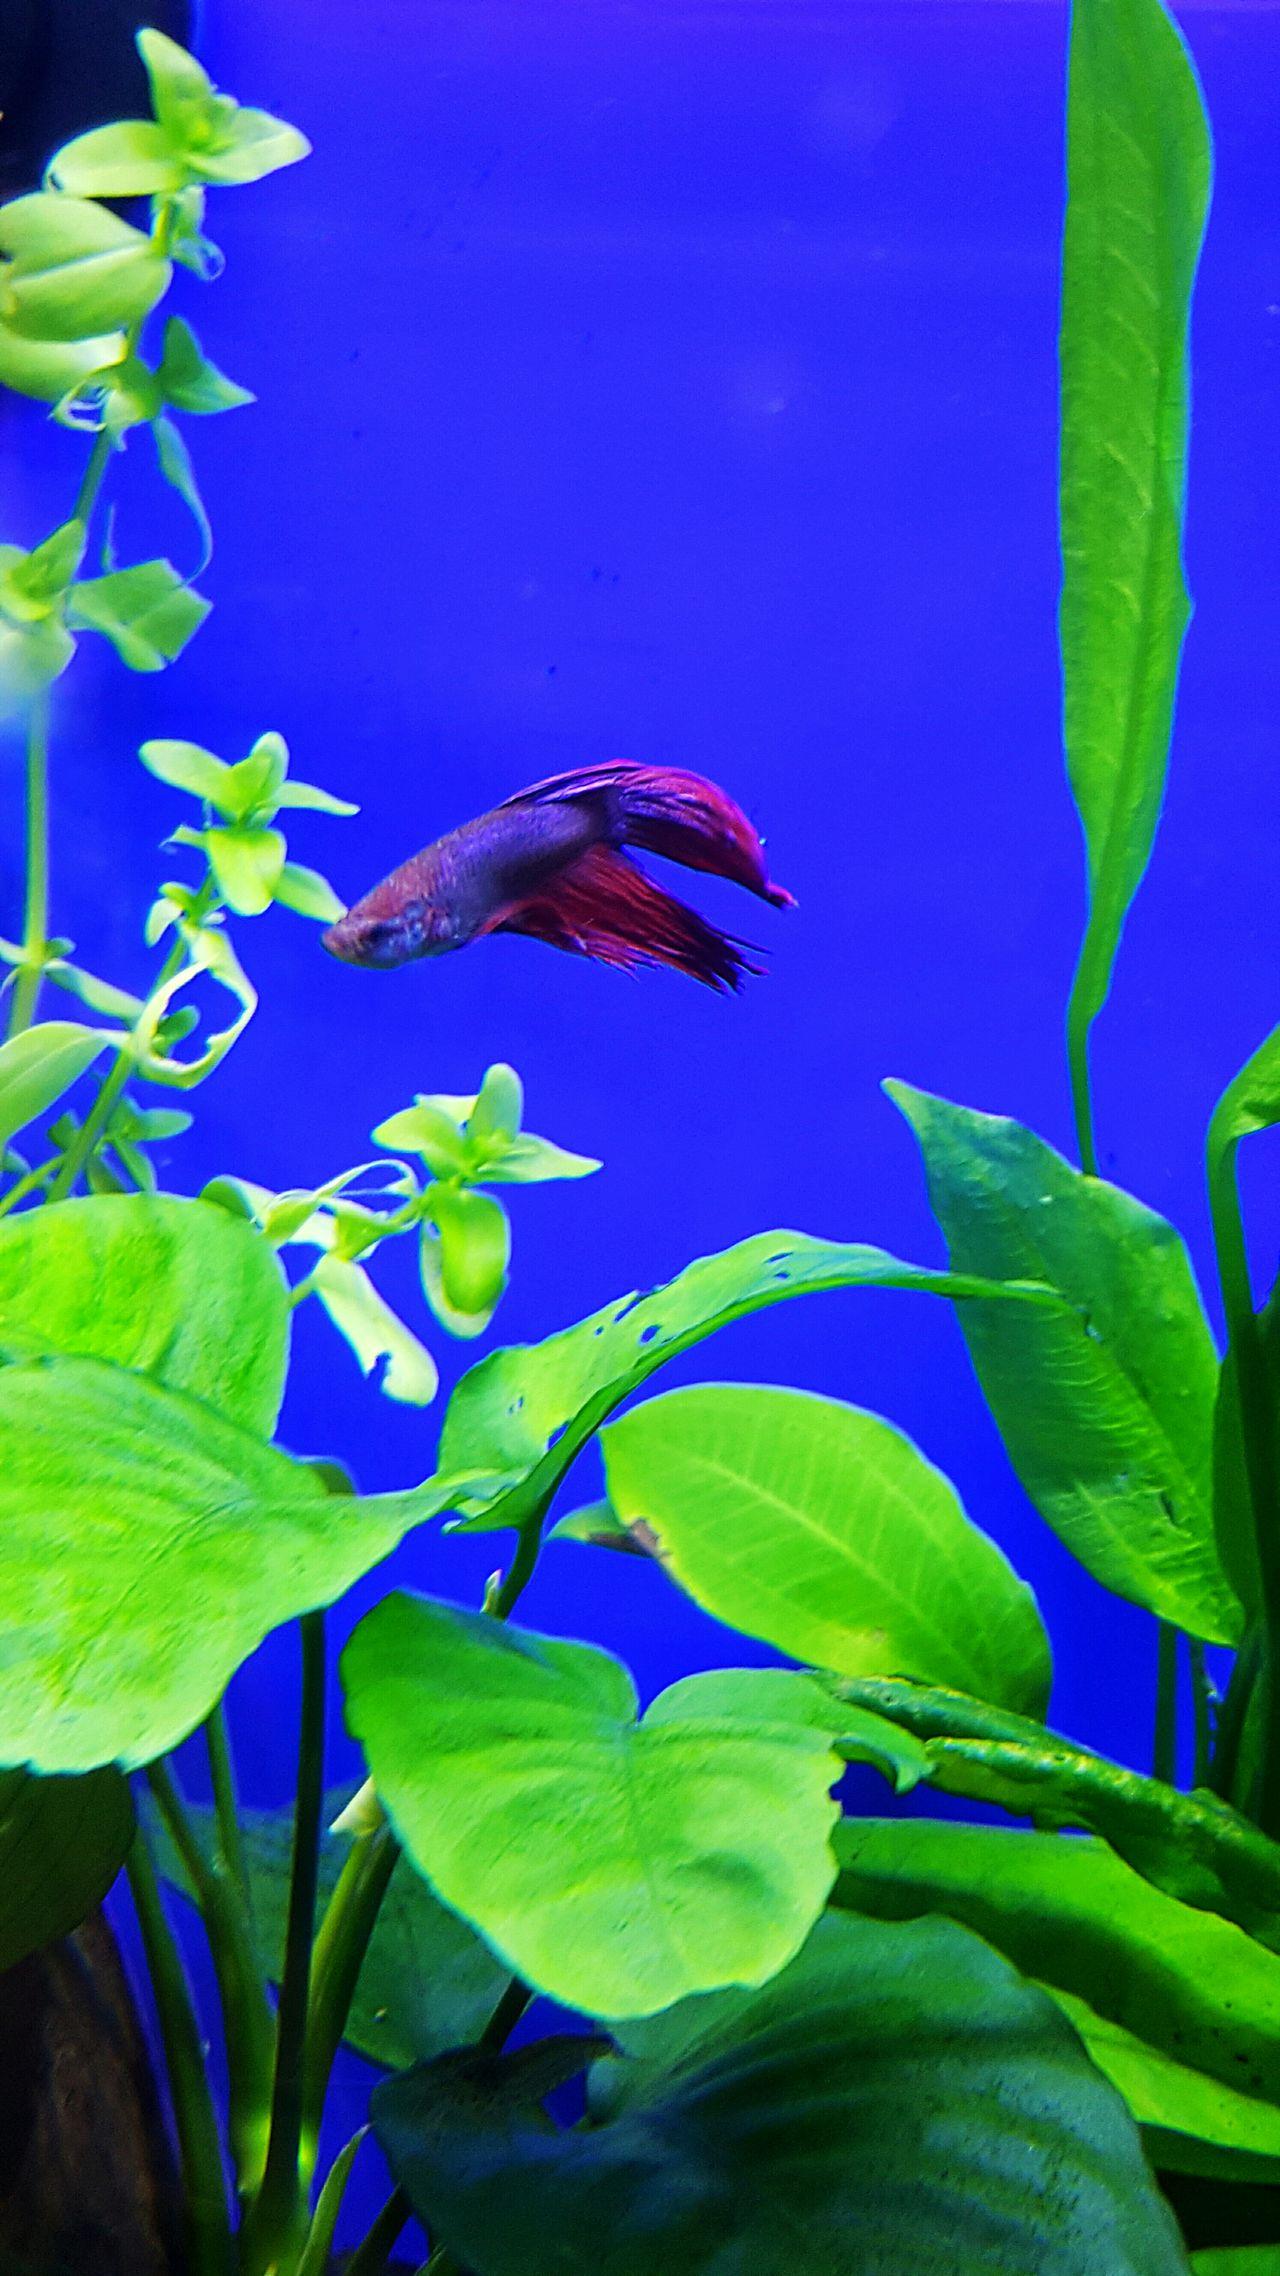 Fish Red Fish Fancy Fish Underwater Photography Pet Green Plants Living Blue Background Beauty In Nature Beautiful Nature Beautiful Fish Tank For Sale EyeEm Best Shots EyeEm Nature Lover Eyem Best Shots Eye4photography  EyeEmBestPics EyeEm Best Shots - Nature Eyemphotography